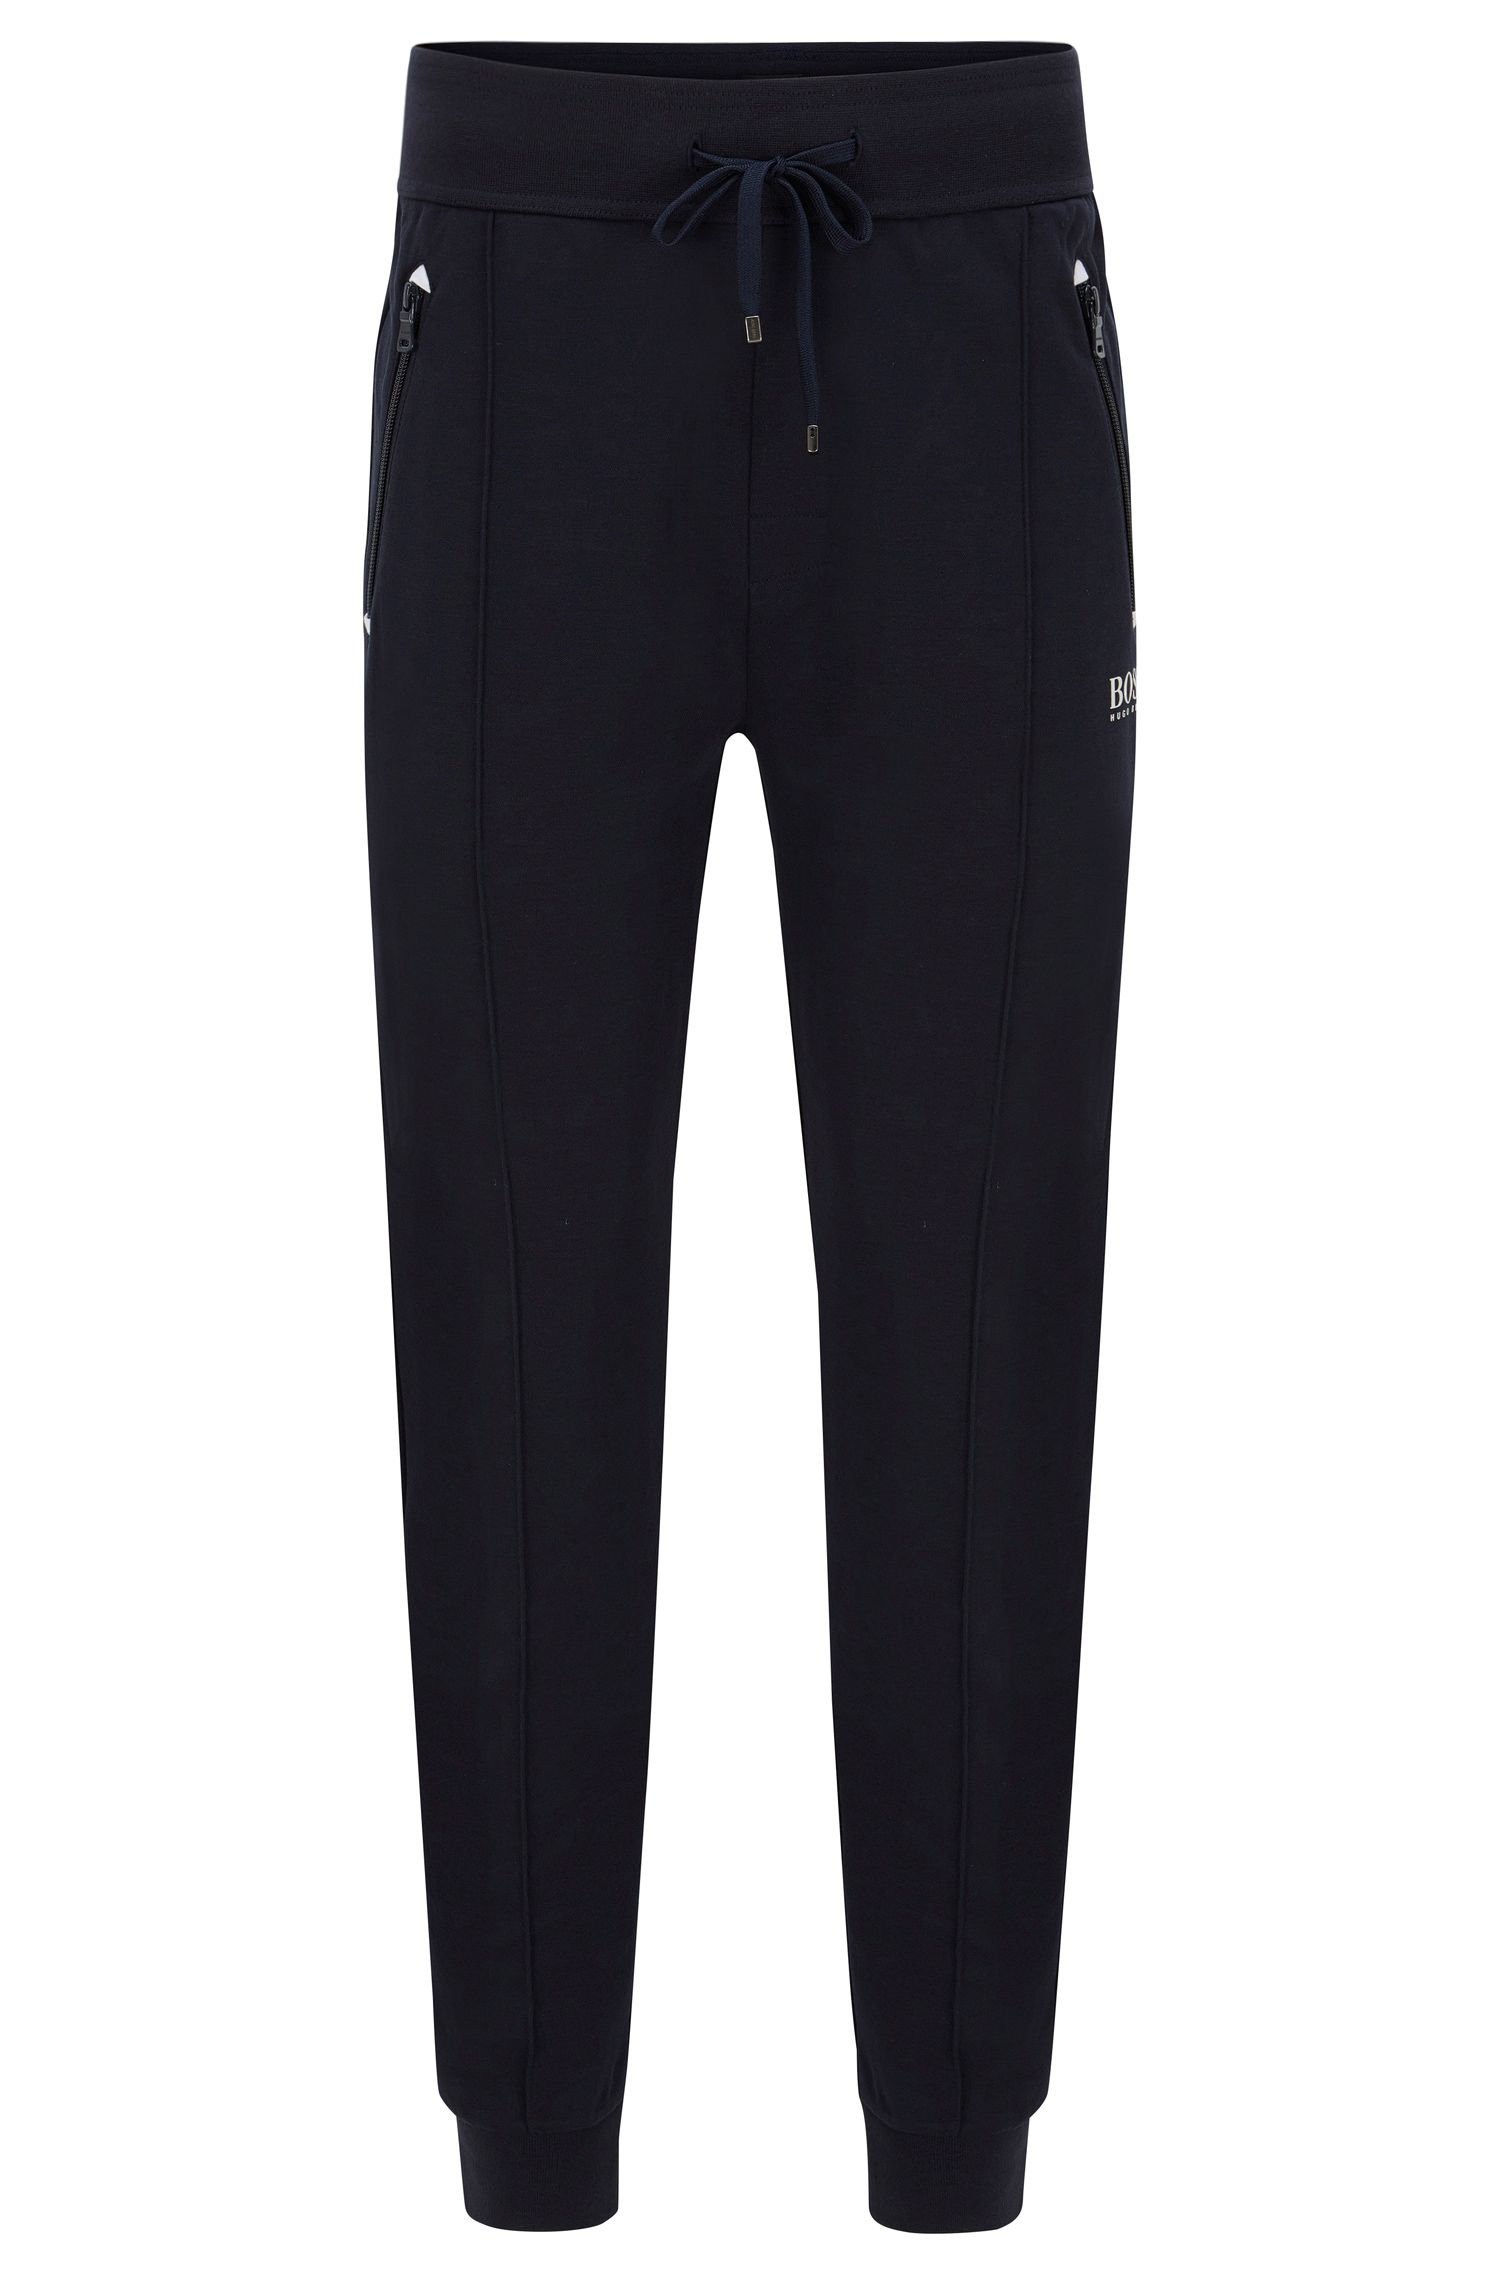 Stretch Cotton Lounge Pant | Long Pant Cuffs